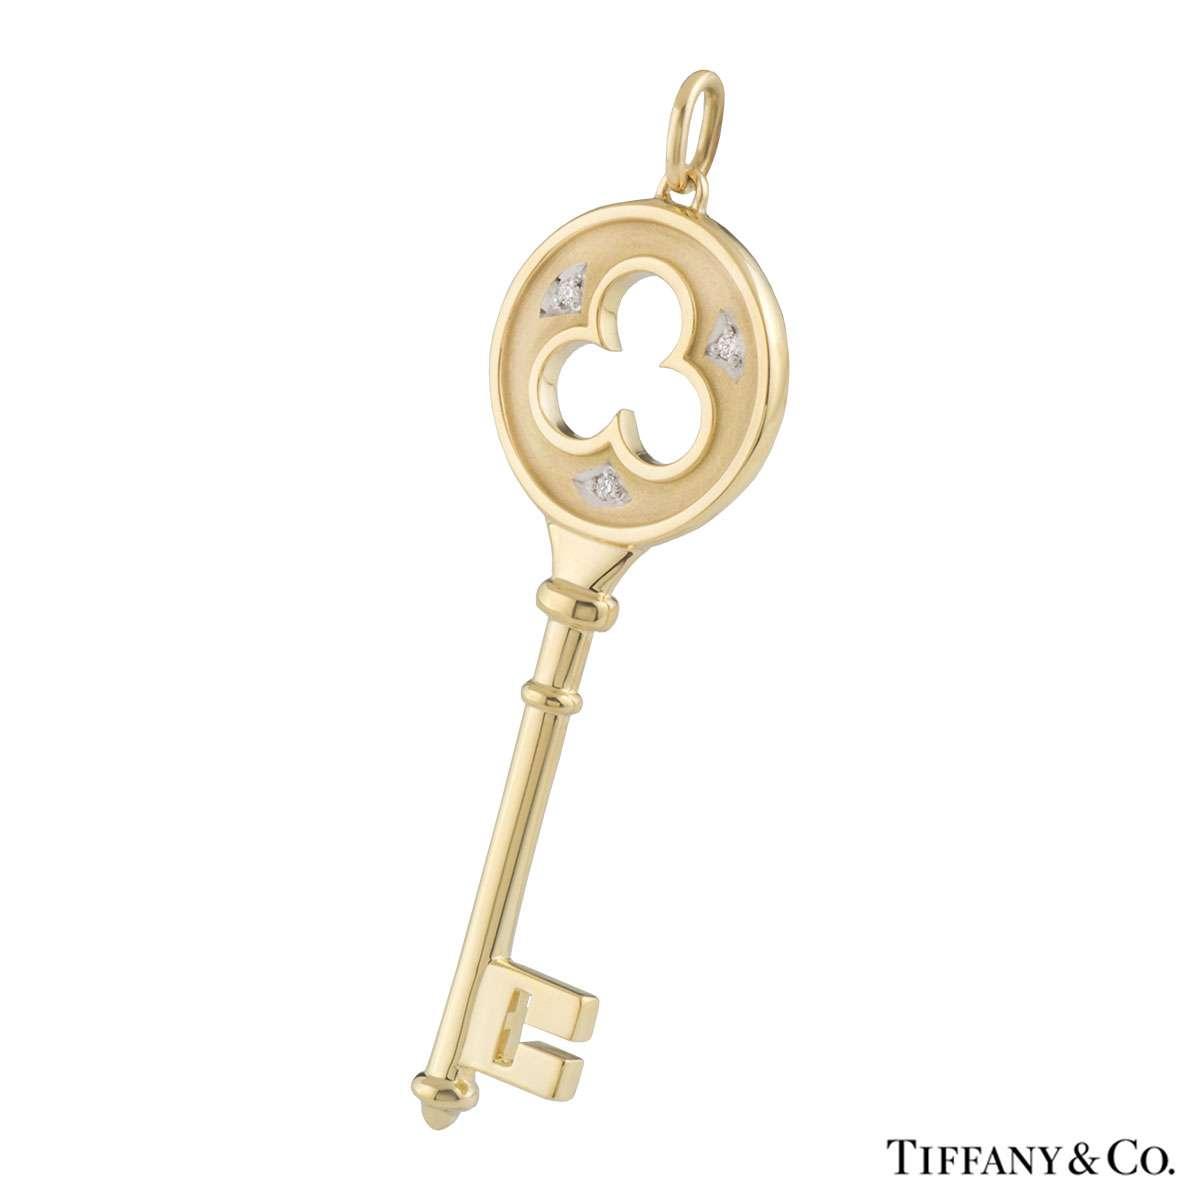 0a3c033c9 Tiffany Co Yellow Gold Diamond Clover Key Pendant. Tiffany Co Key Pendant